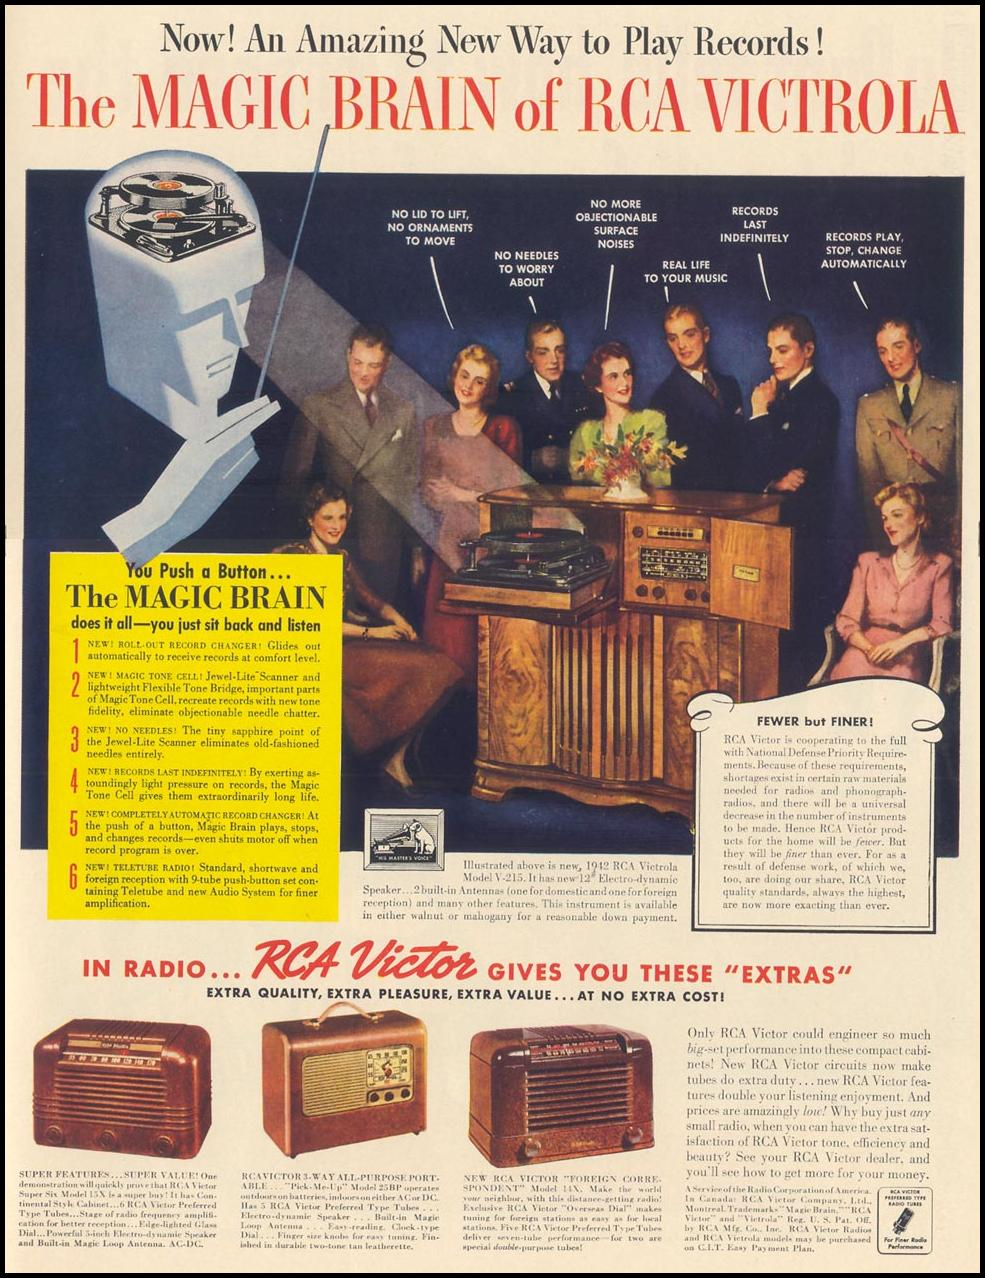 RCA VICTROLA LIFE 10/13/1941